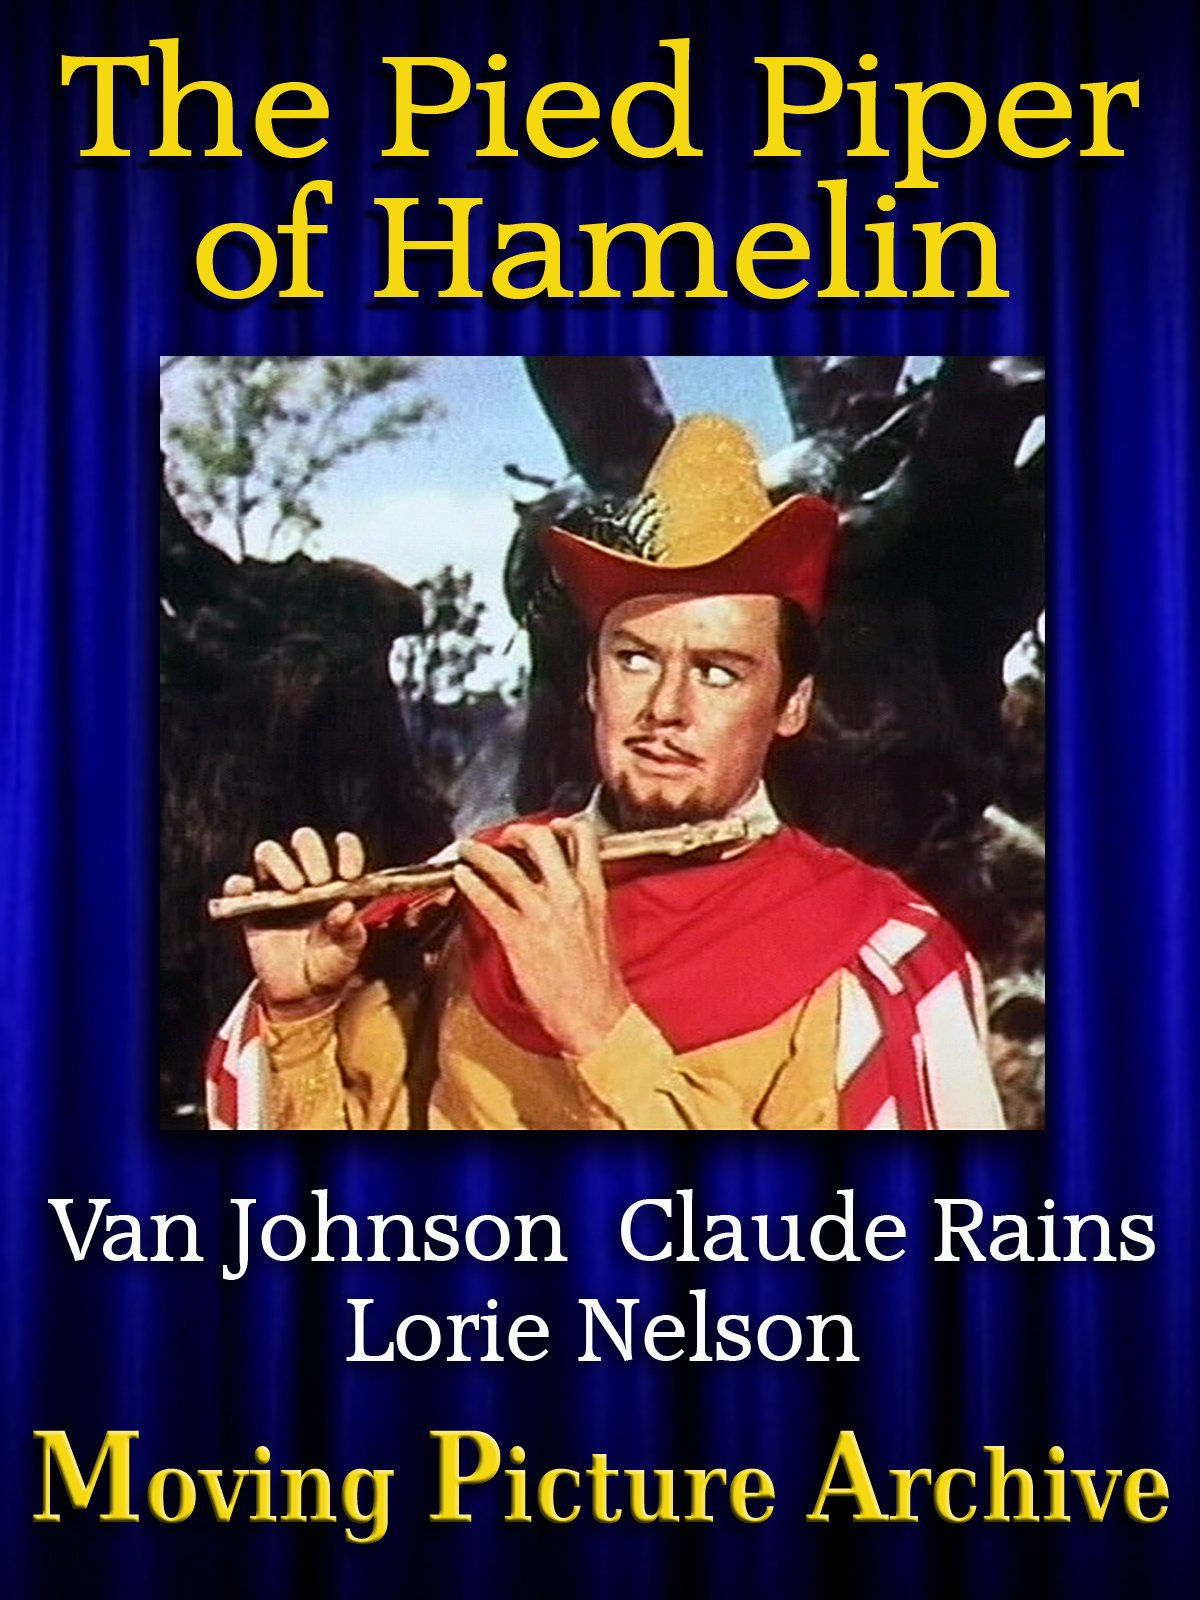 Pied Piper of Hamelin - 1958 - Color